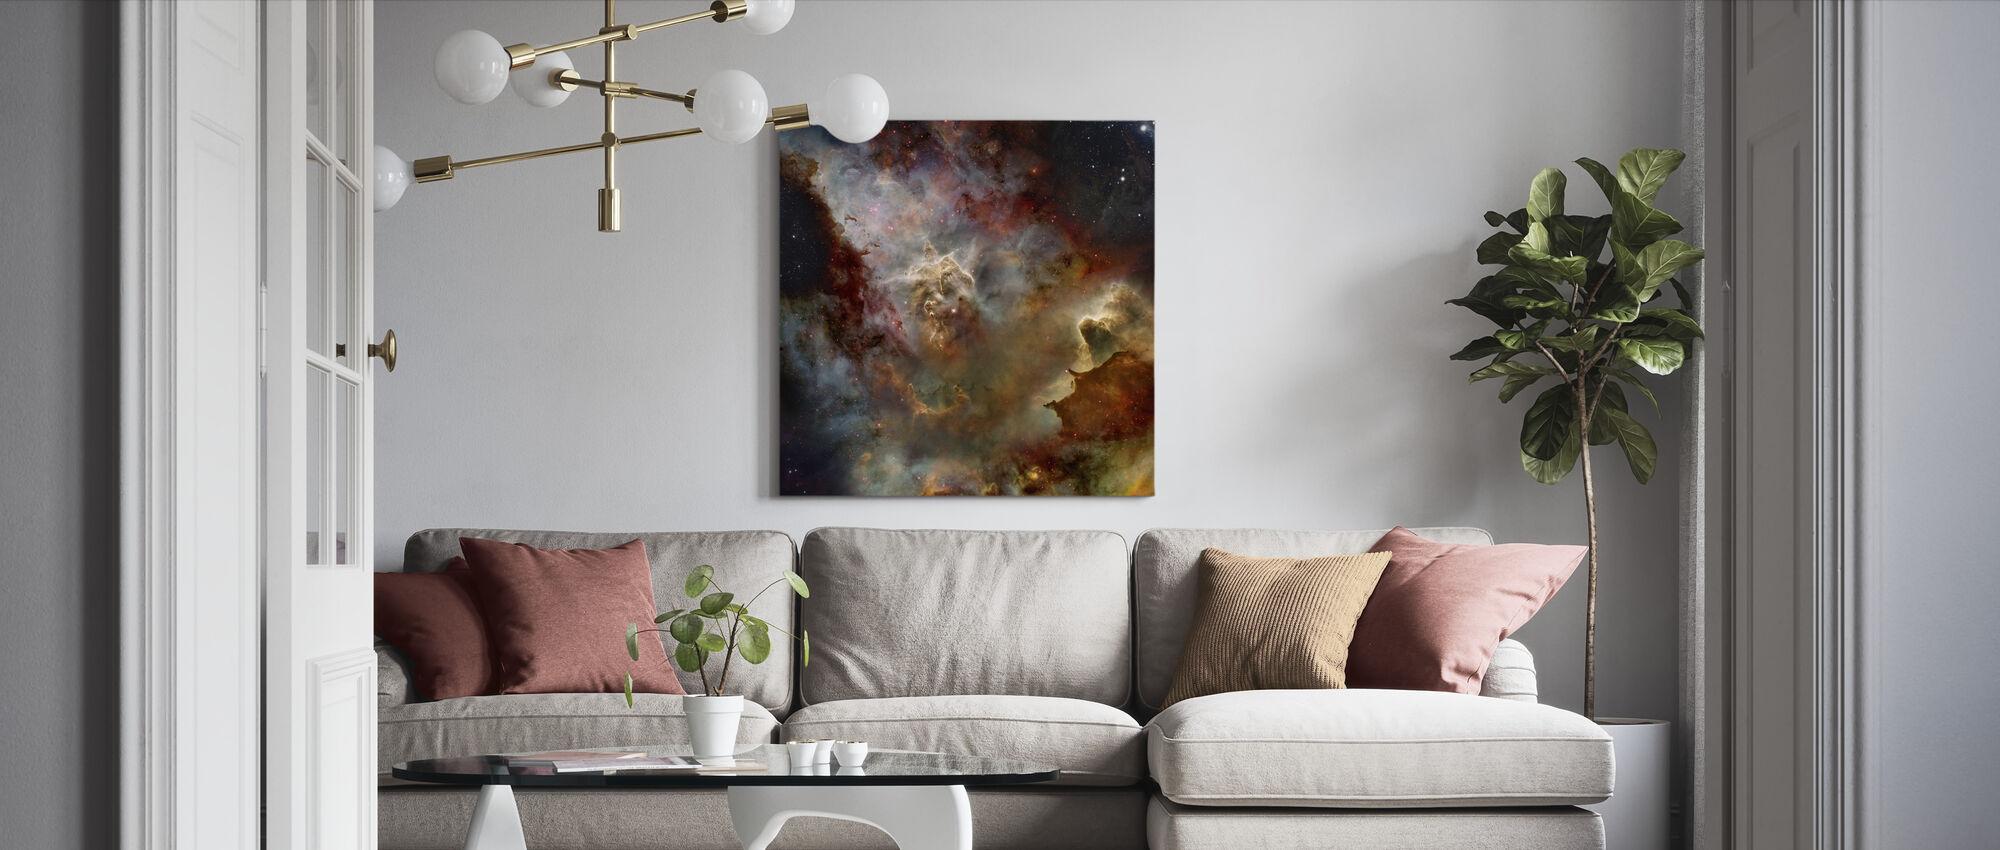 Deep Space Nebula - Canvas print - Living Room